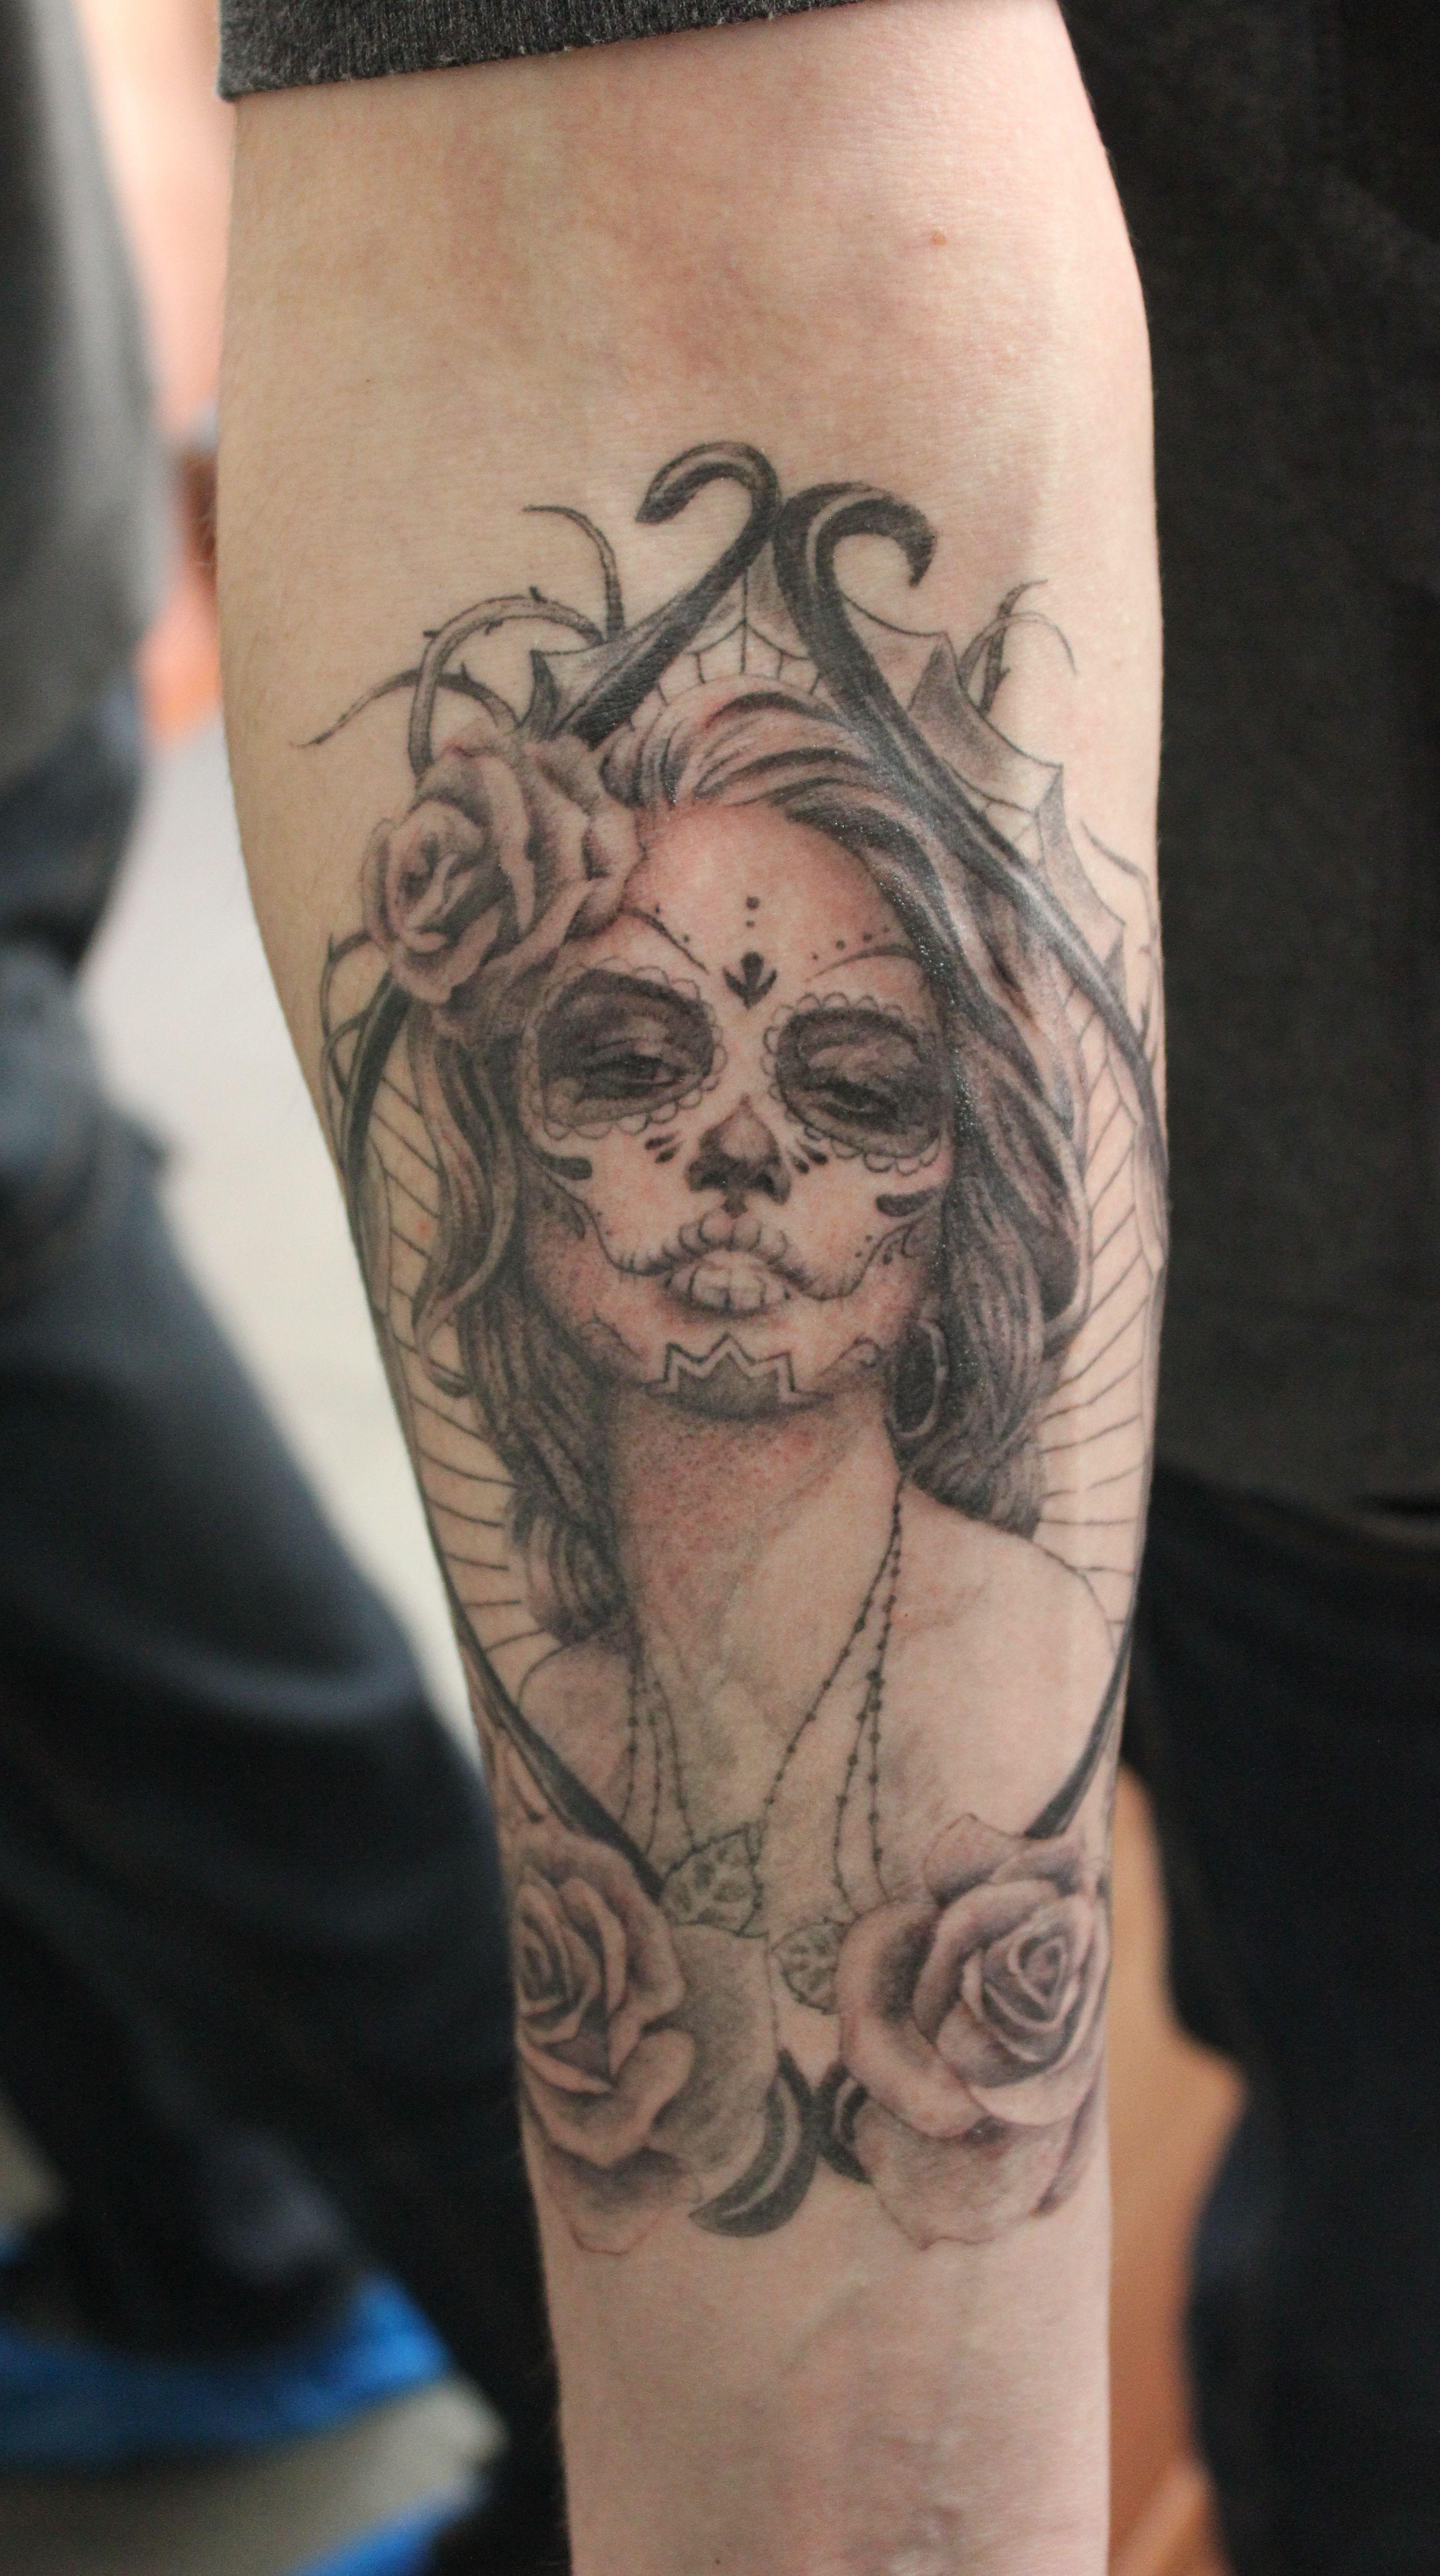 Tatouage sablier signification galerie tatouage - Santa muerte tatouage signification ...